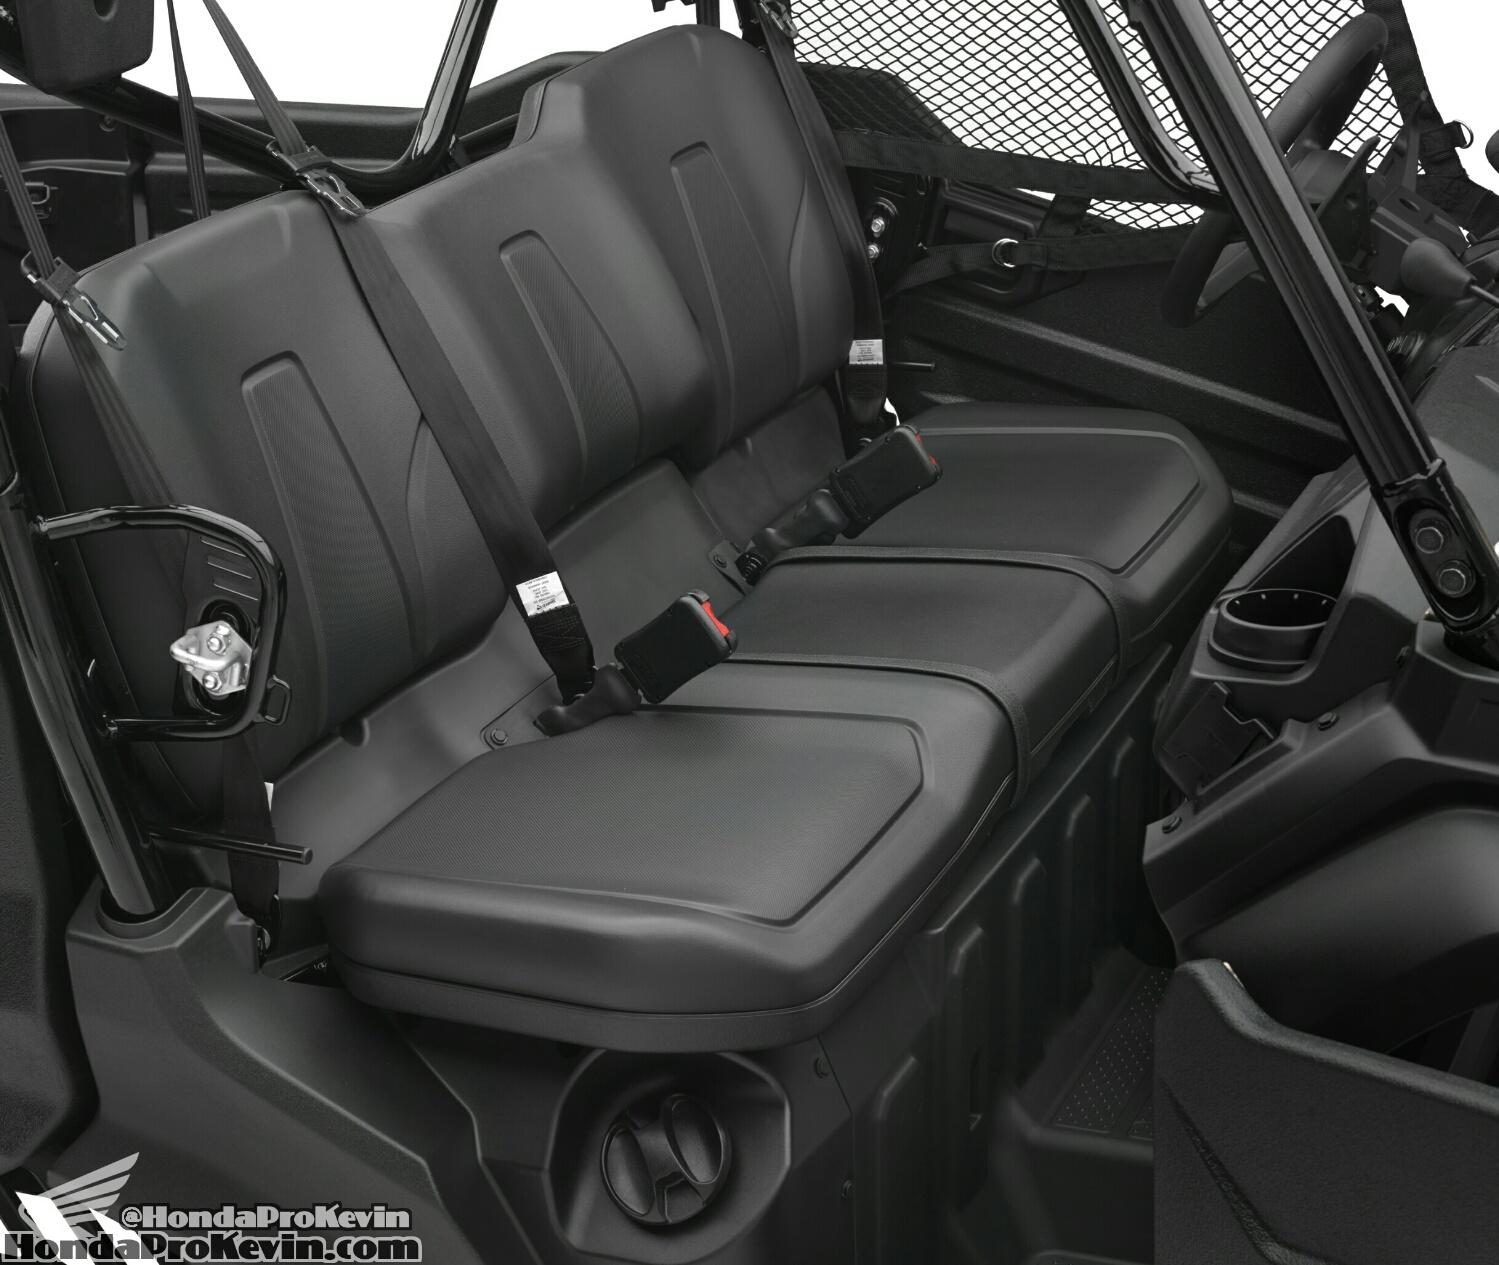 2016 Honda Pioneer 1000 5 Sxs Engine Frame Suspension